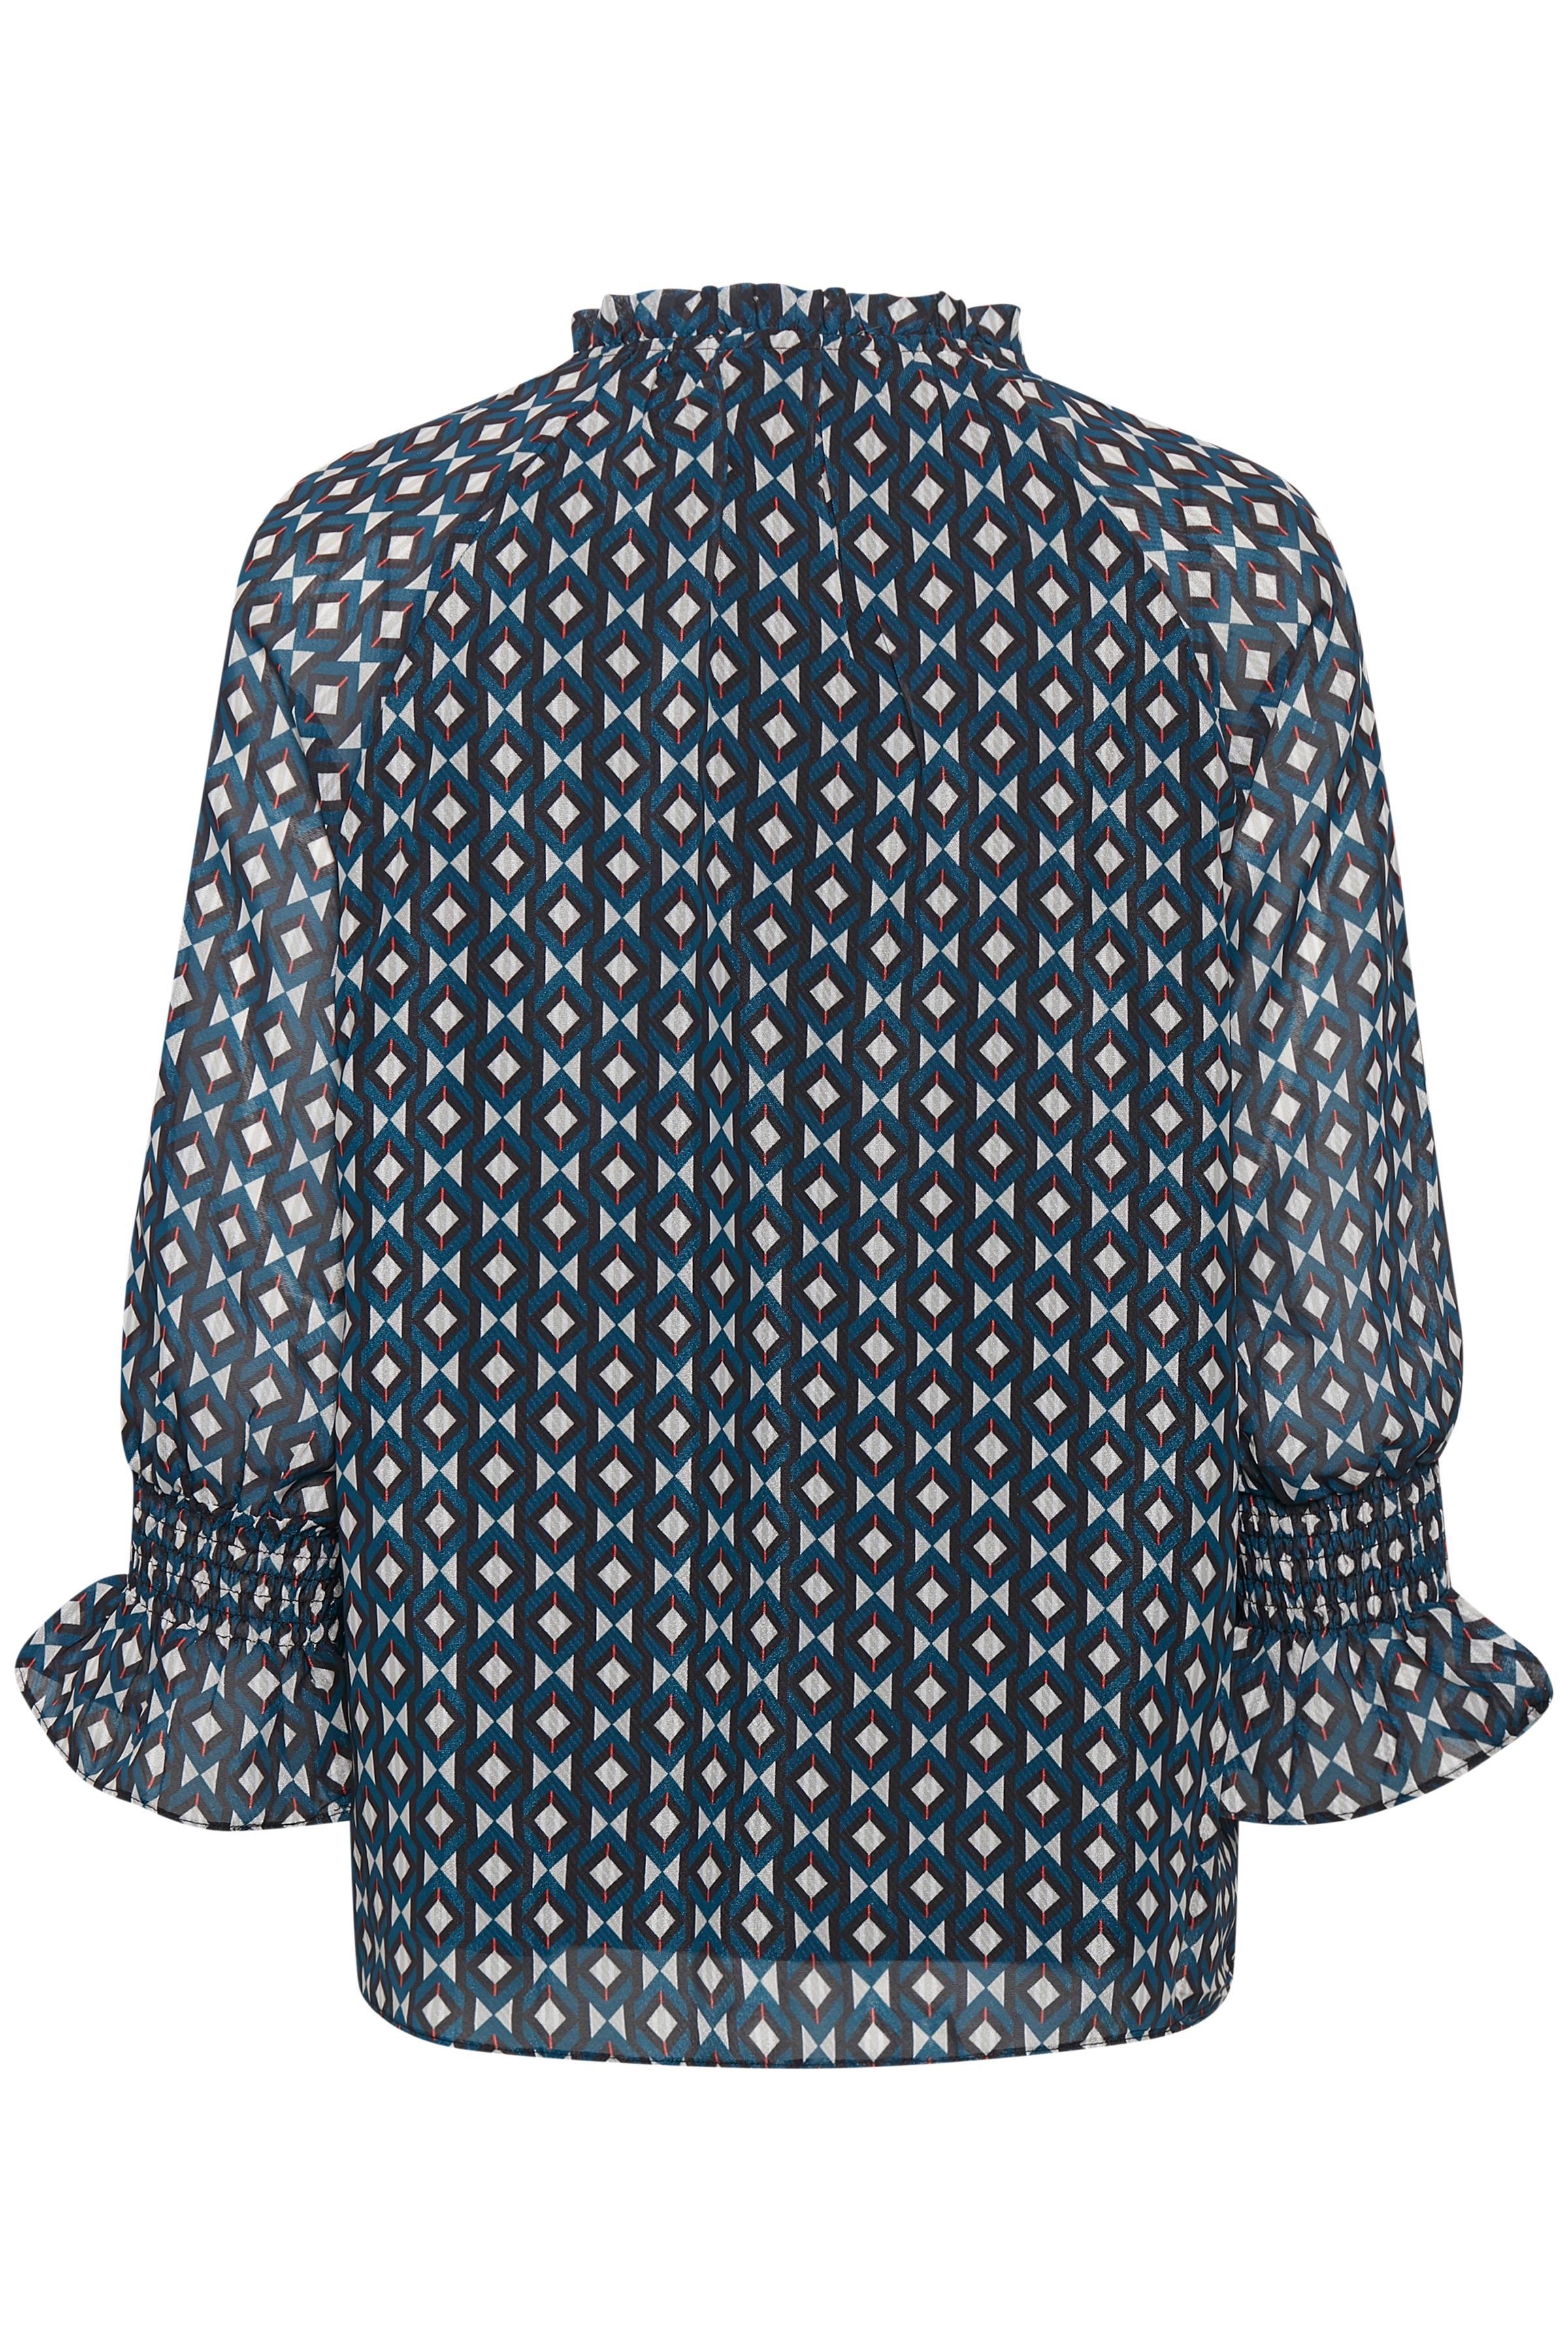 Petrol/off-white Langærmet bluse fra Fransa – Køb Petrol/off-white Langærmet bluse fra str. XS-XXL her